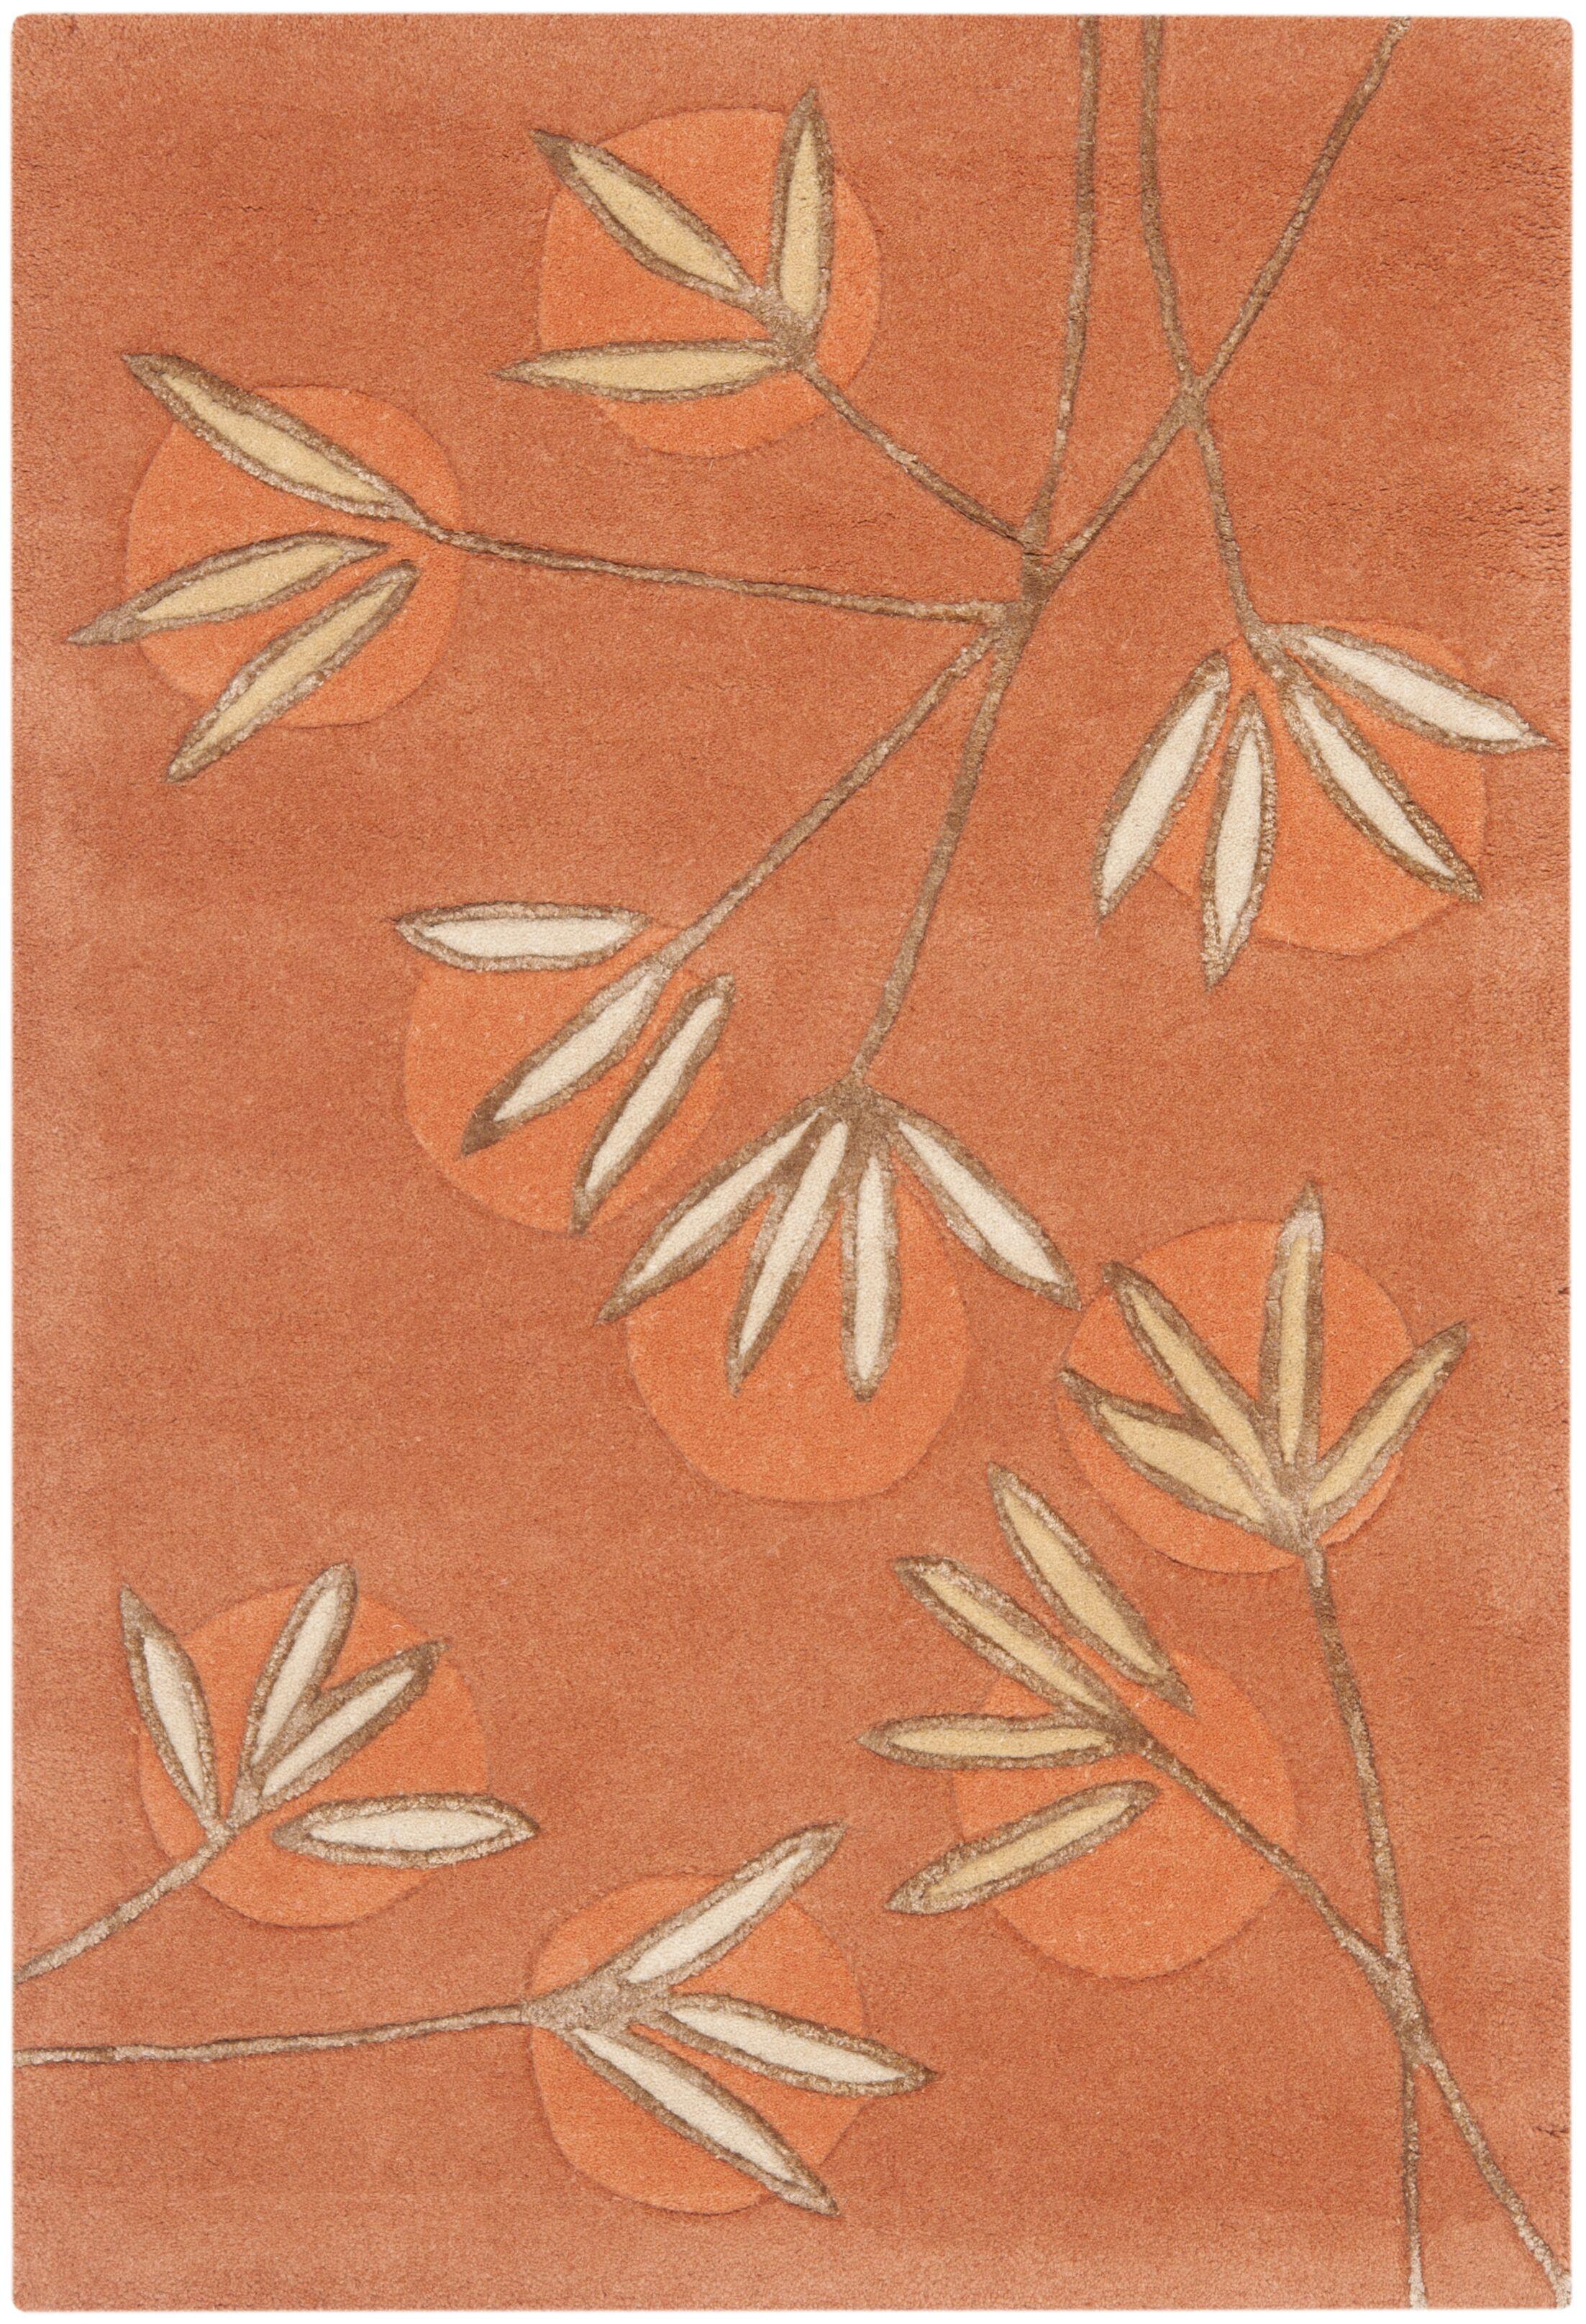 Felton Hand-Tufted Rust Area Rug Rug Size: Rectangle 3'6